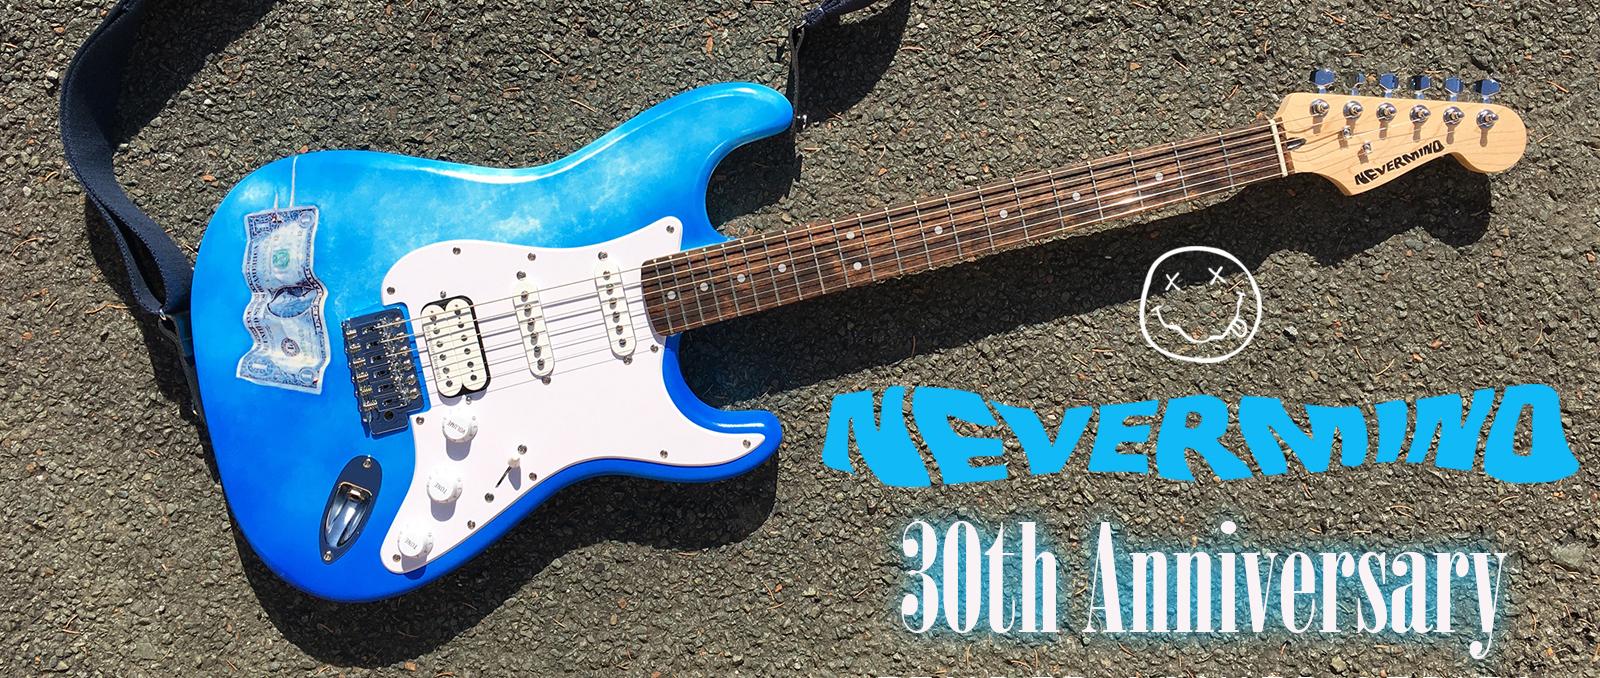 Nervemind-30th-Anniversary-Kurt-Cobain-Stratocaster-header